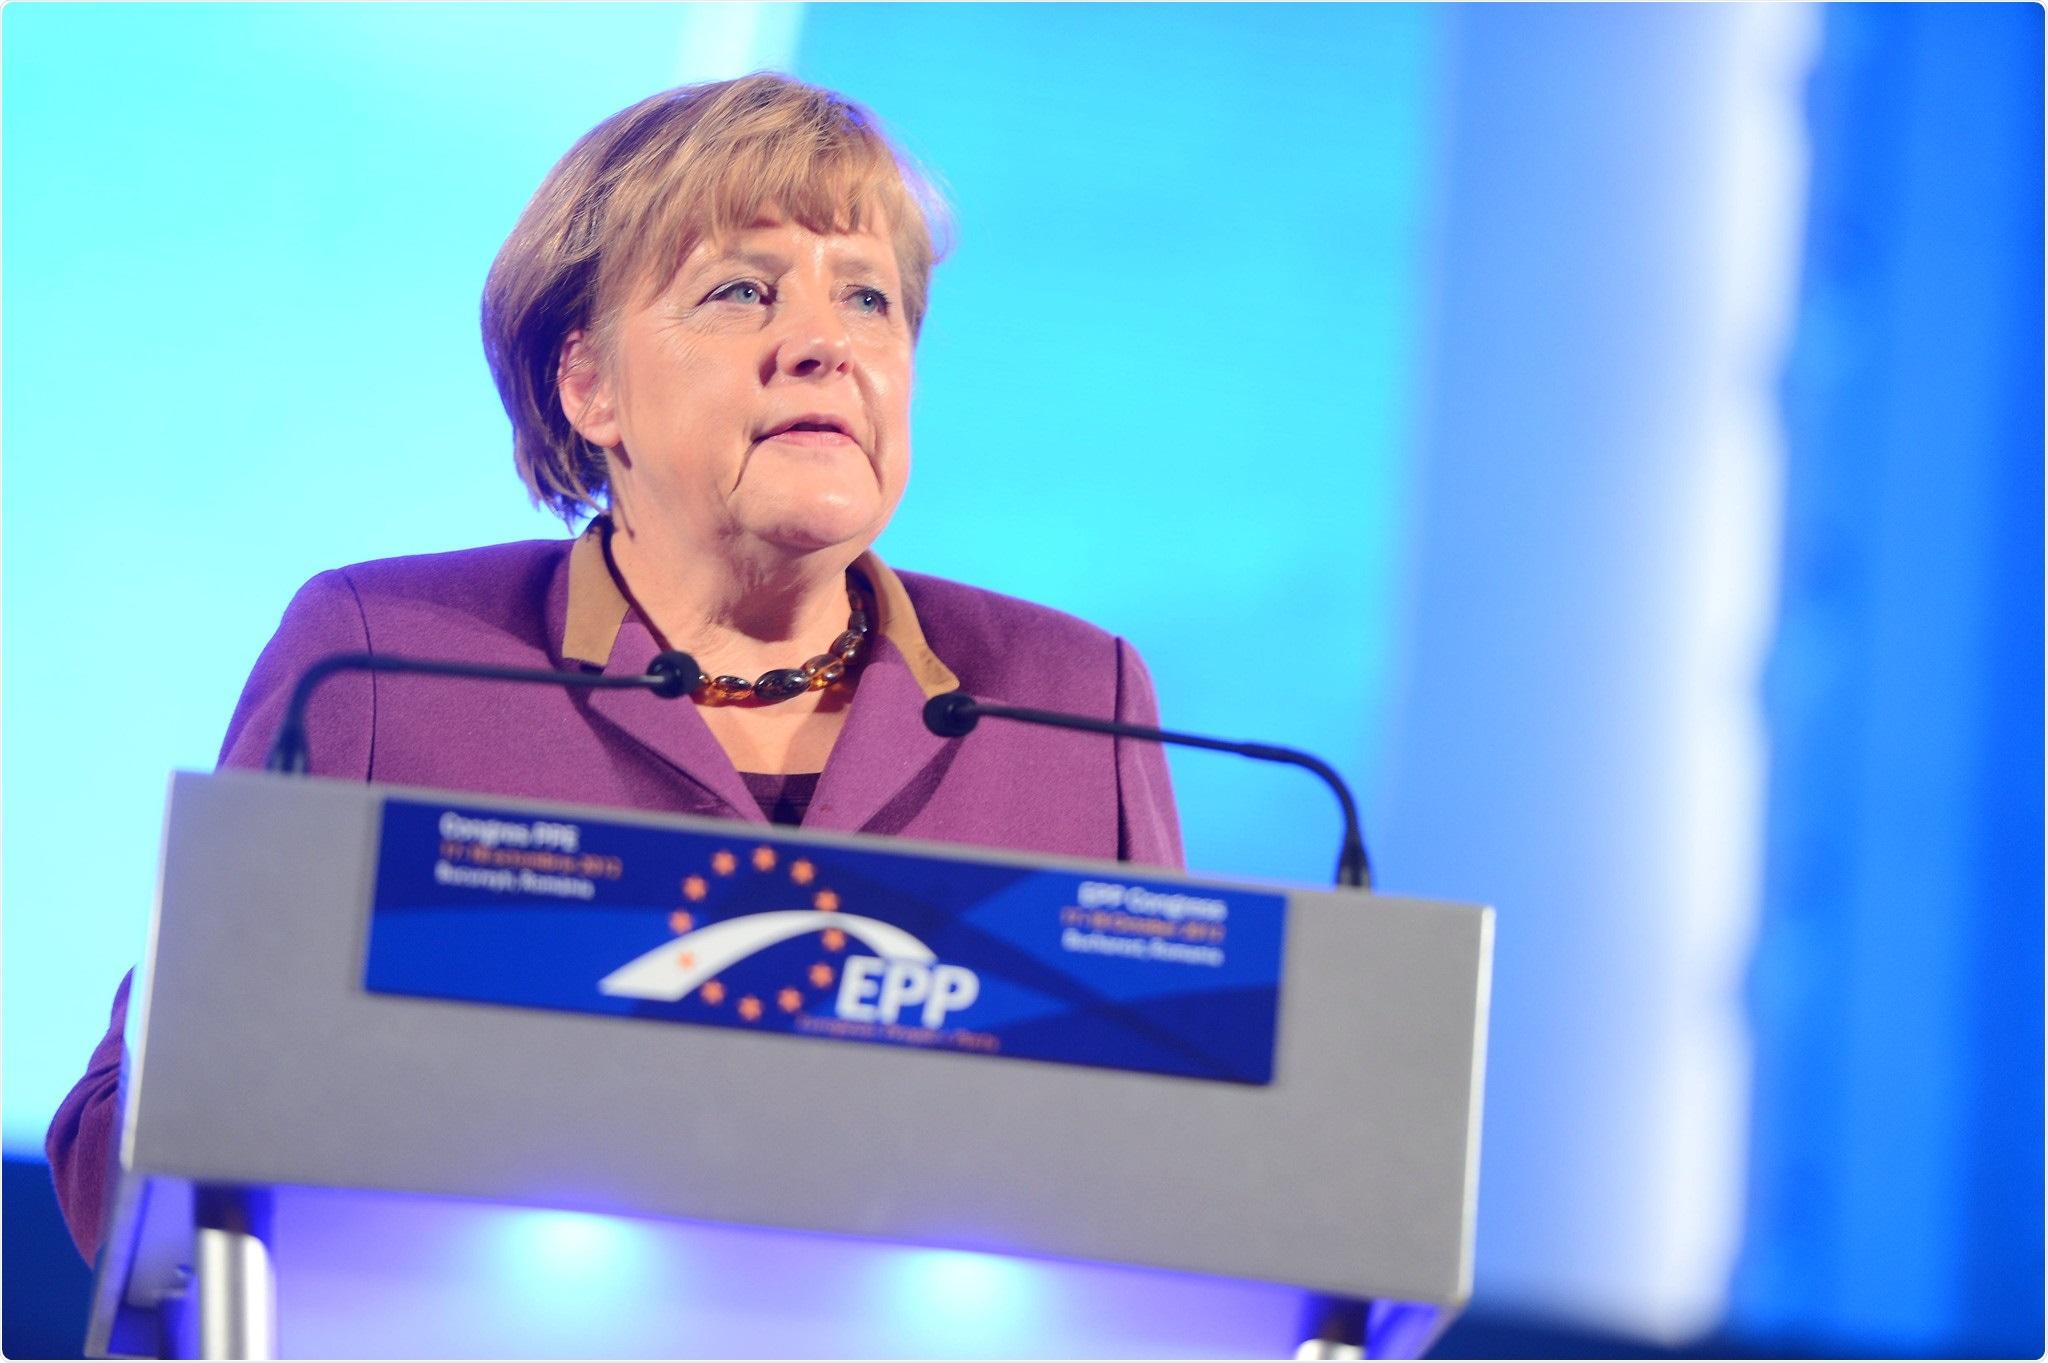 Angela Merkel, Chancellor of Germany. Image Credit: European People